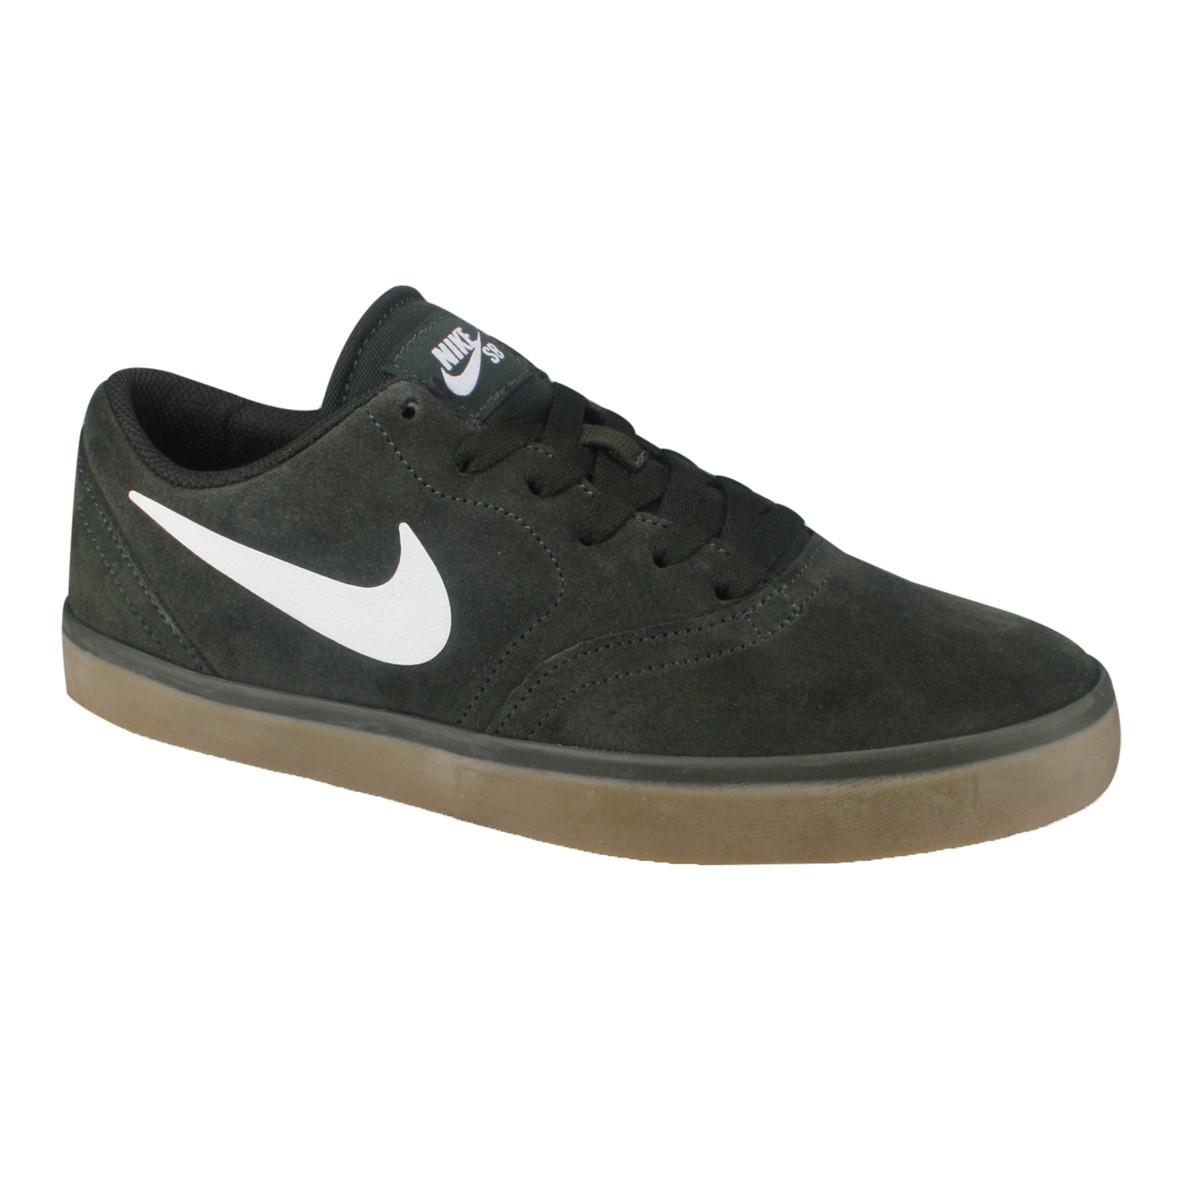 Nike Sb Verdes